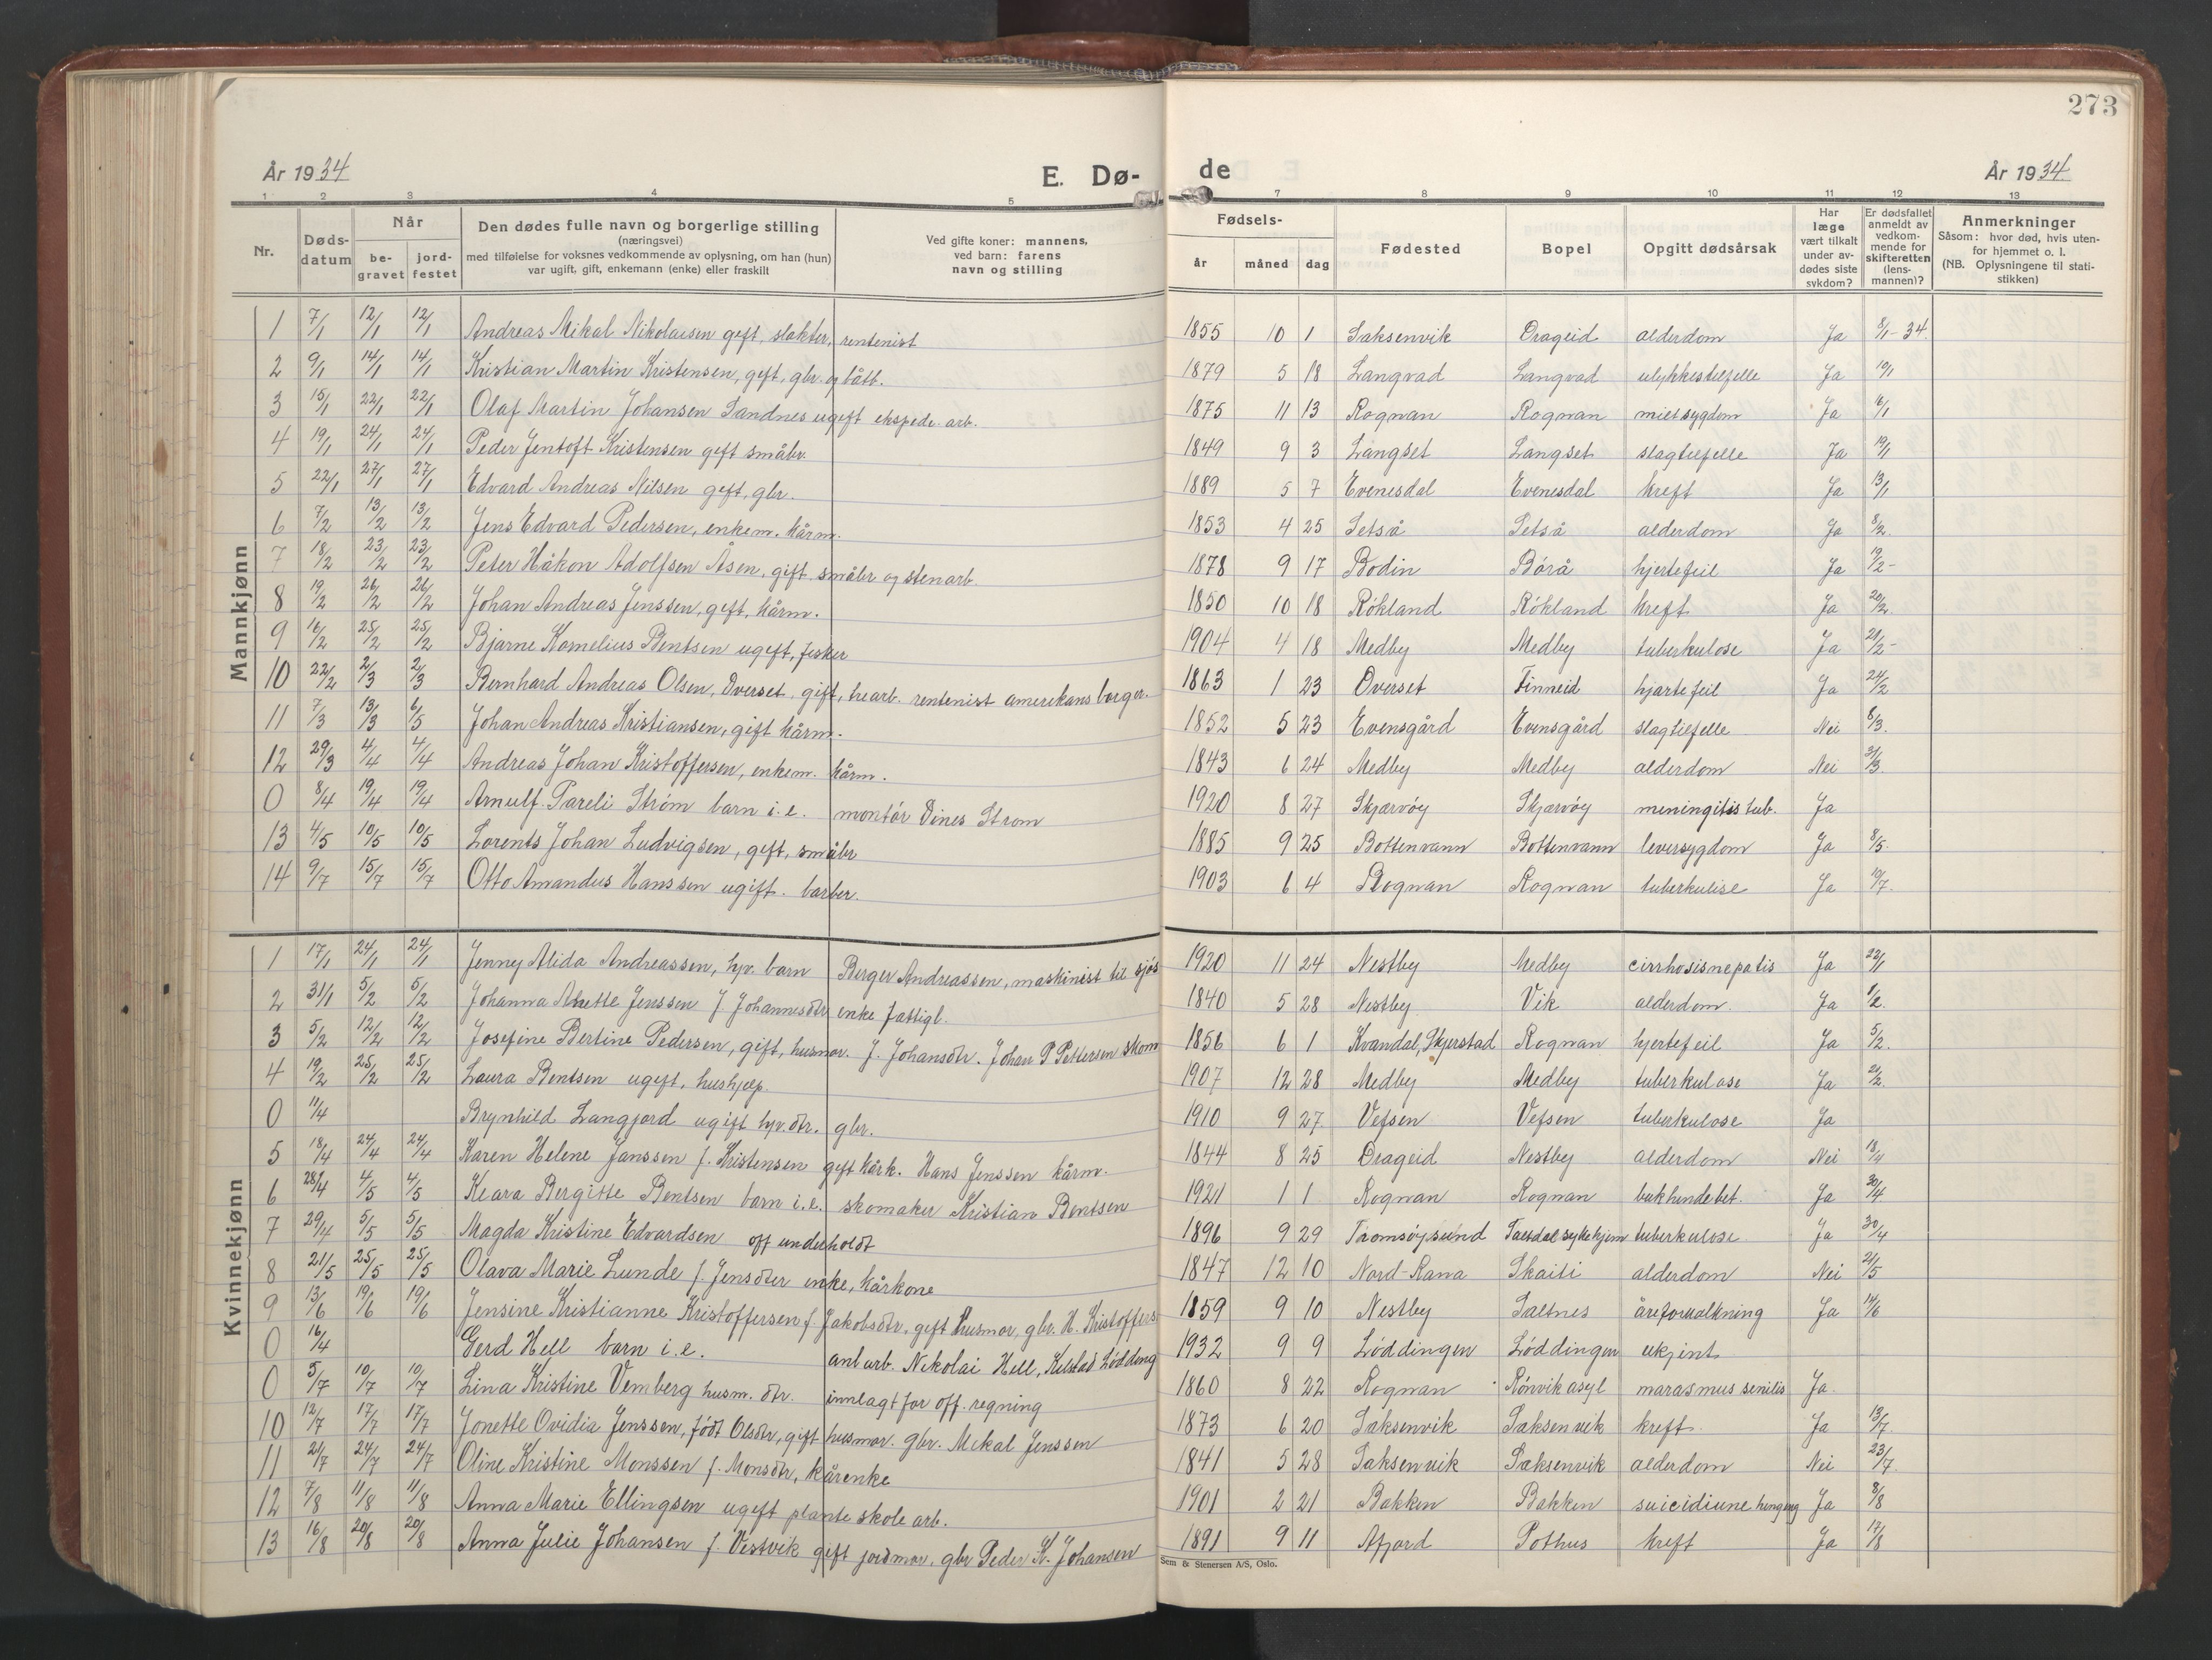 SAT, Ministerialprotokoller, klokkerbøker og fødselsregistre - Nordland, 847/L0680: Klokkerbok nr. 847C08, 1930-1947, s. 273